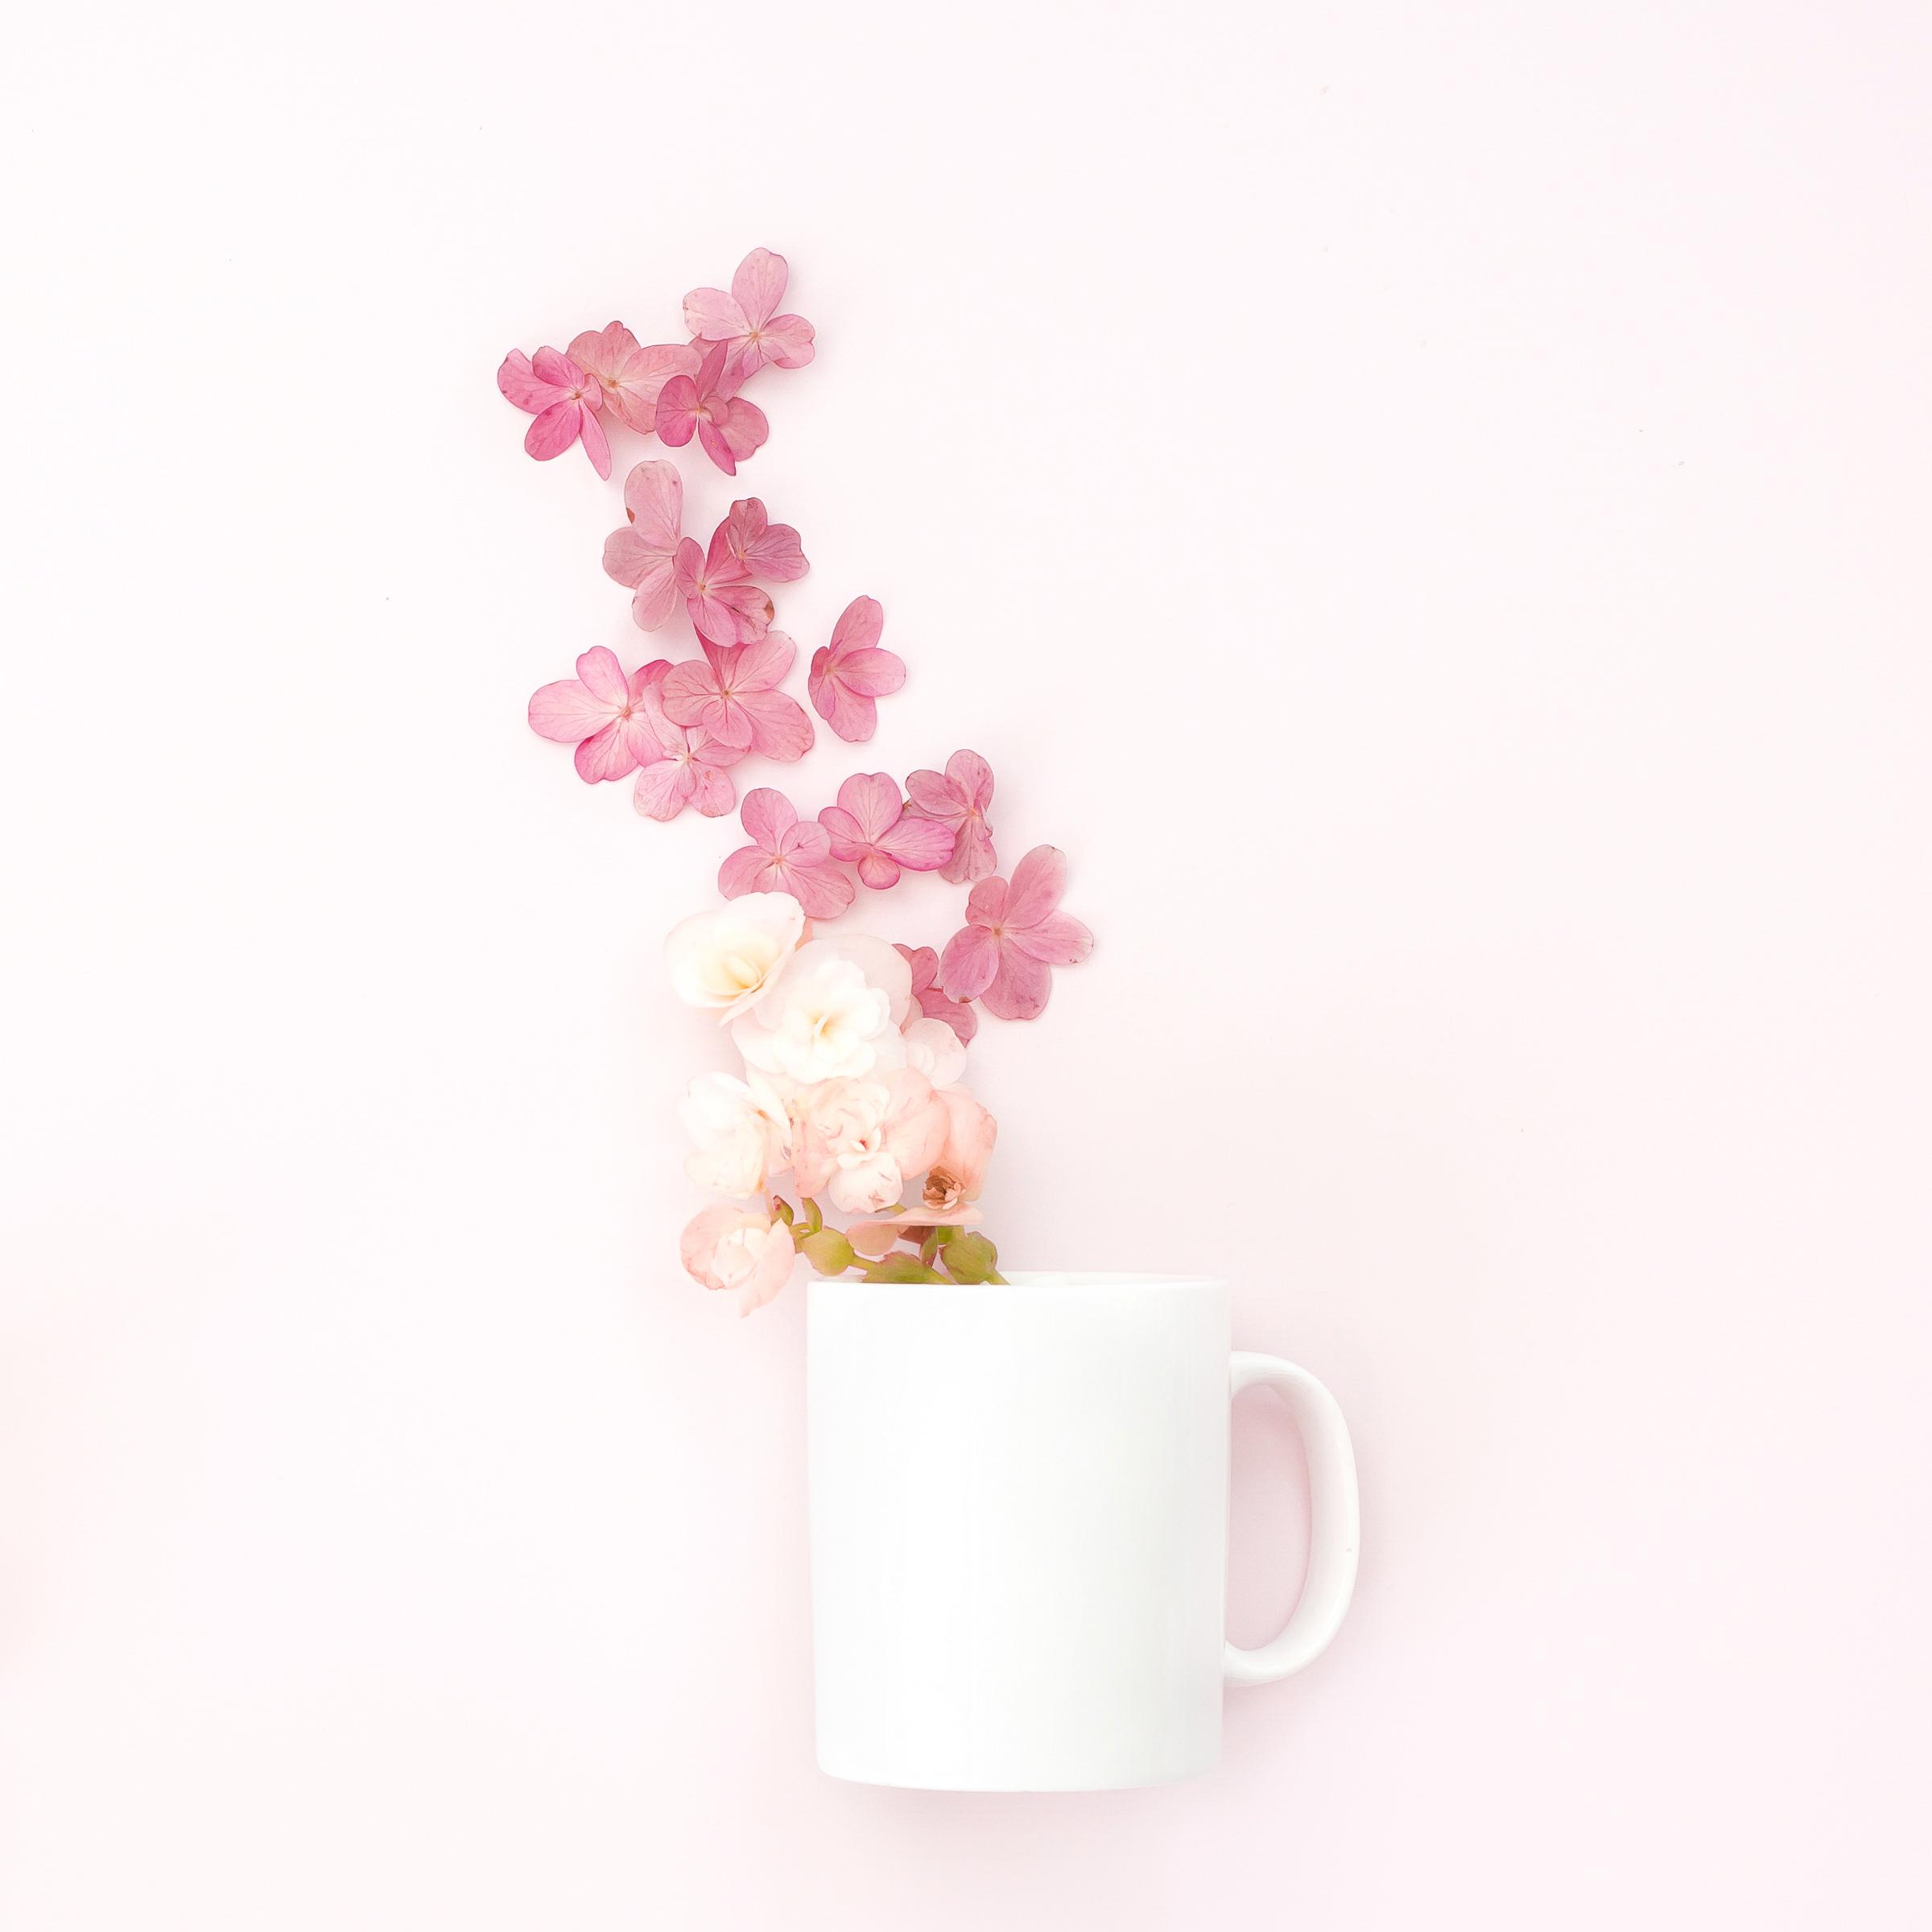 haute-stock-photography-pink-chic-final-18.jpg